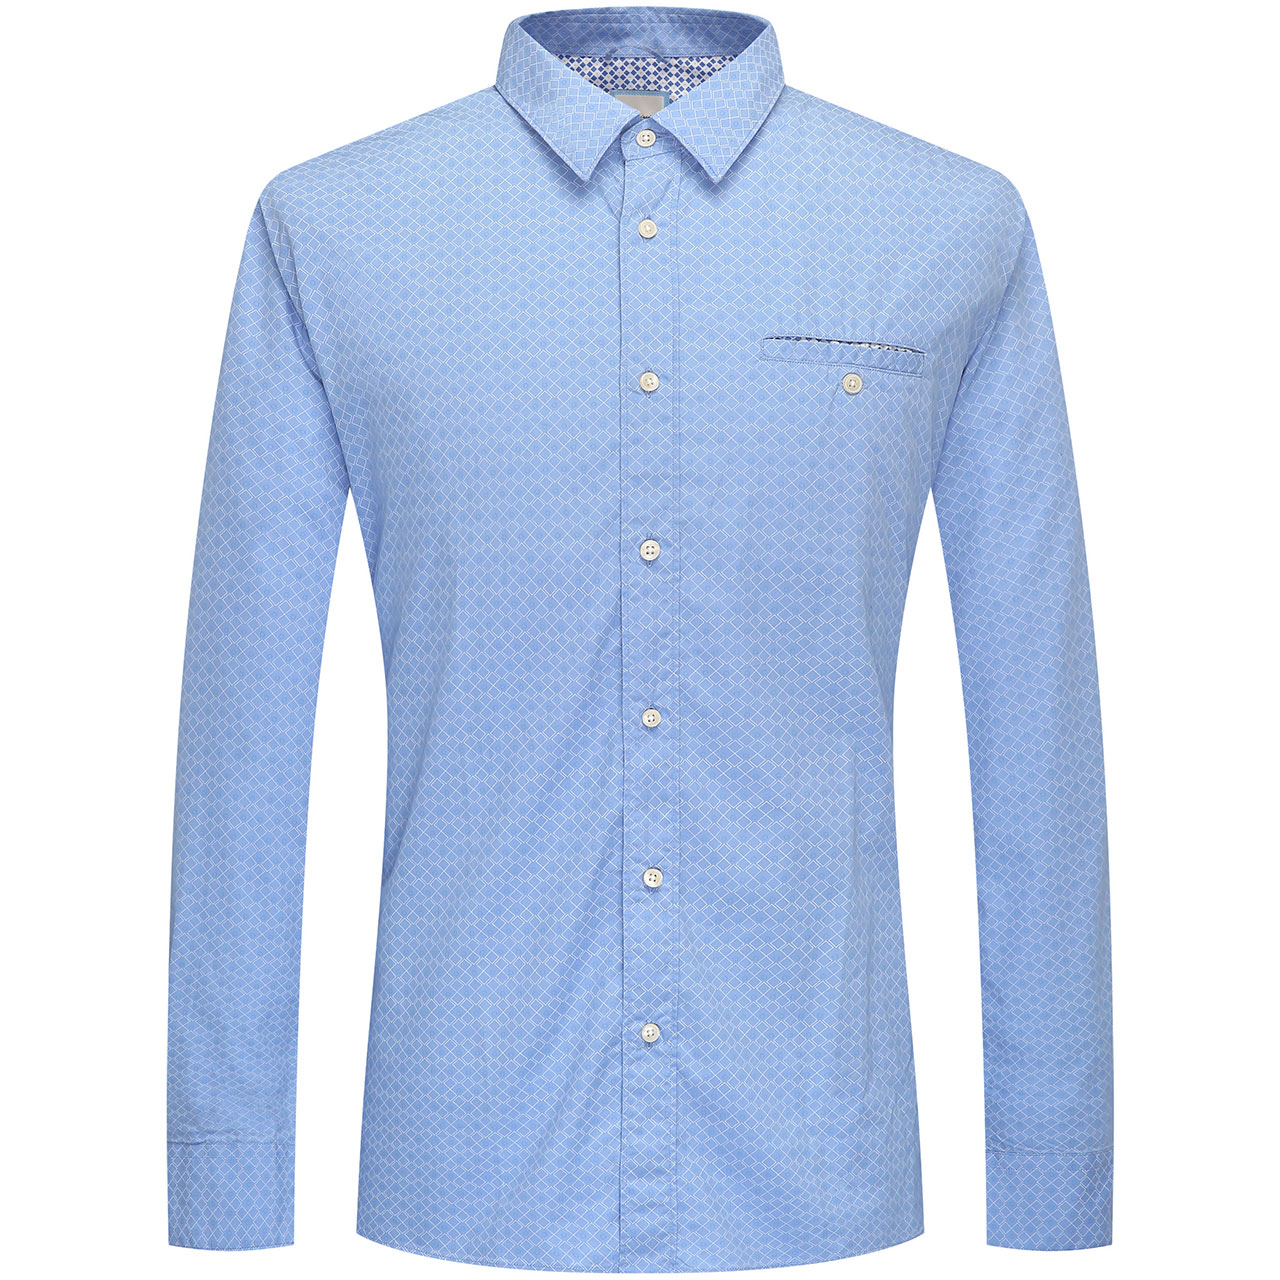 CAMICISSIMA/恺米切春秋新款男士纯棉长袖衬衫 蓝色印花休闲衬衣